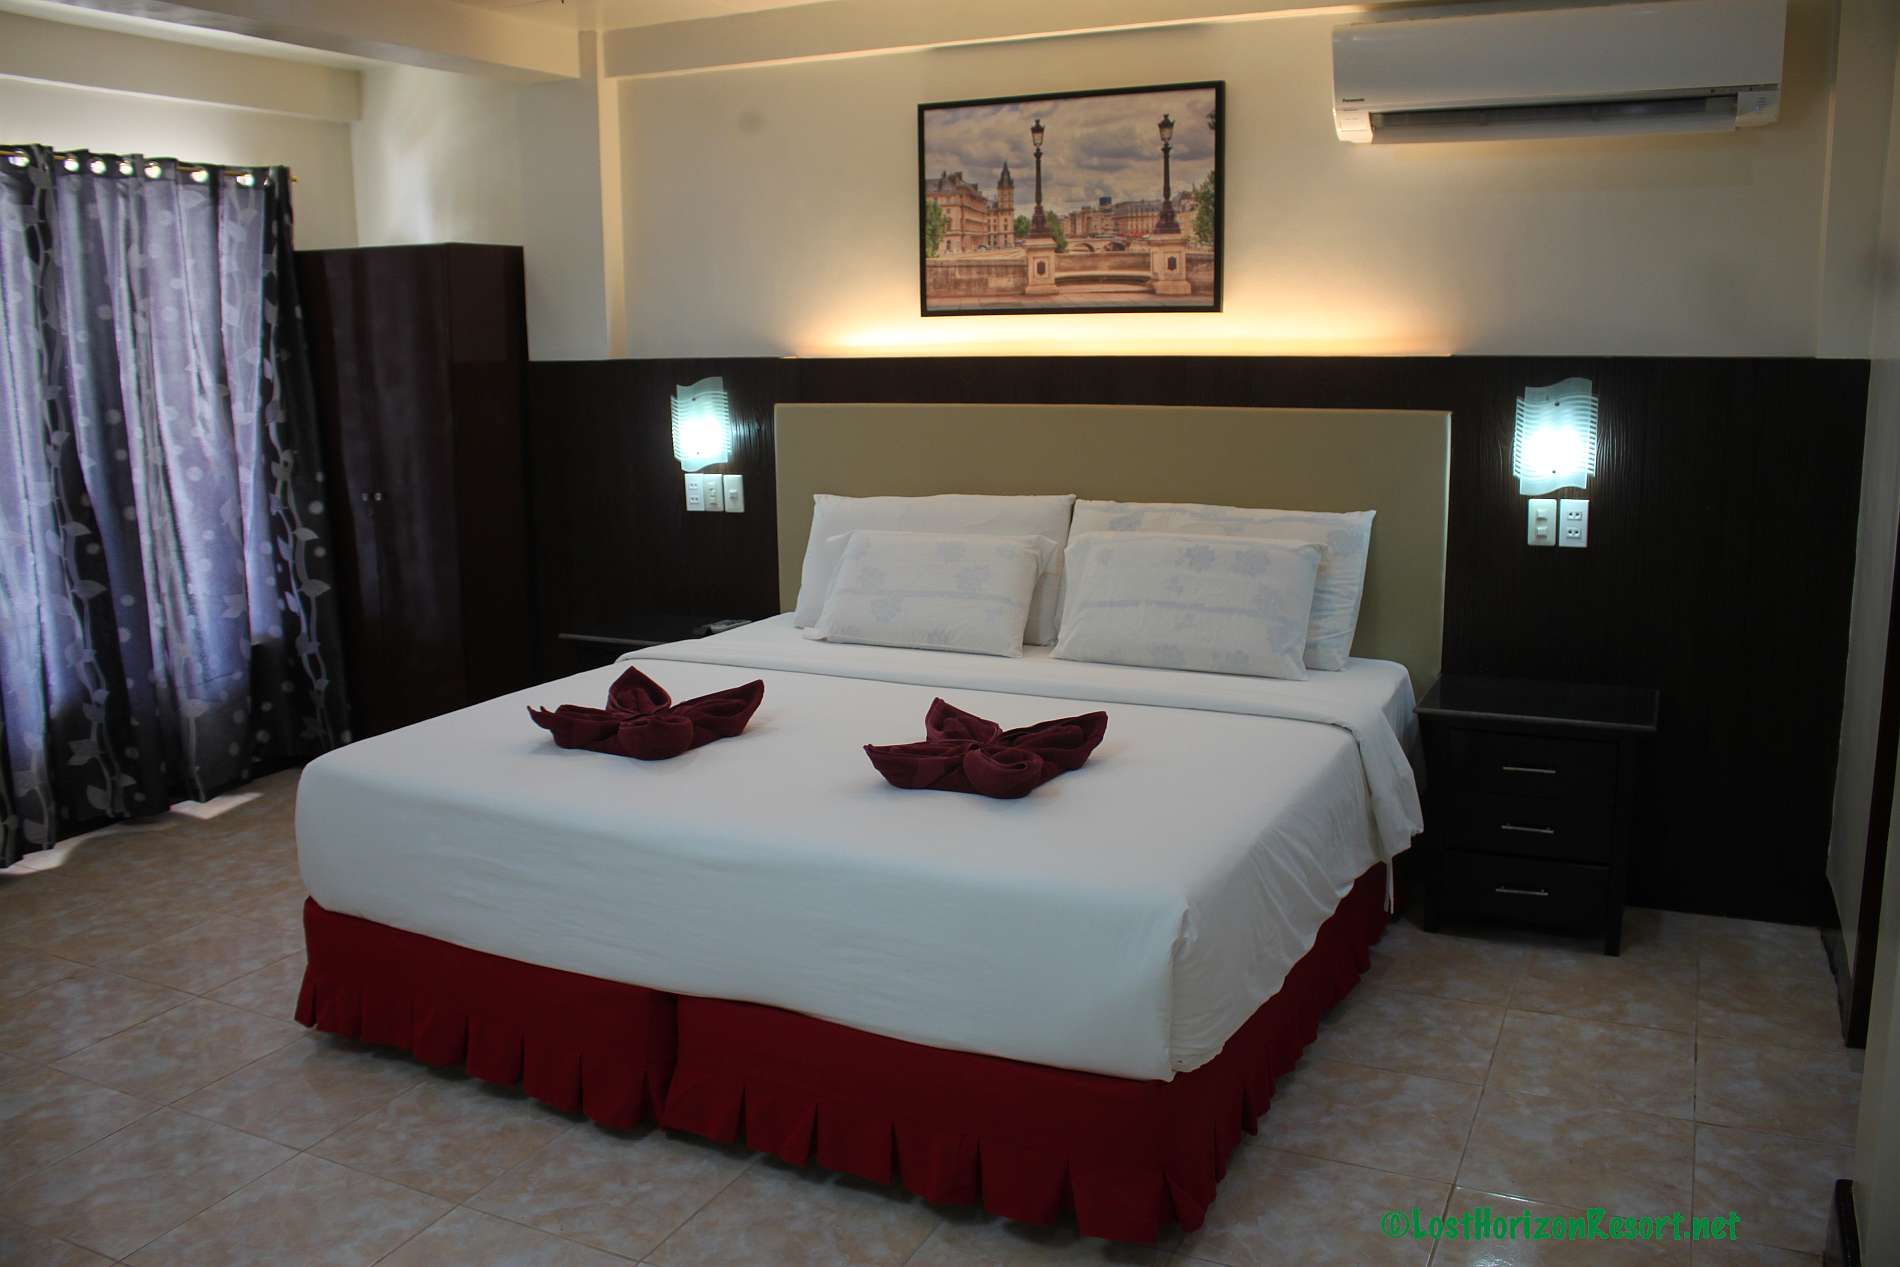 Lost-Horizon-Beach-Resort-Alona-Beach-Panglao-Bohol-Philippines-sun-view-room078